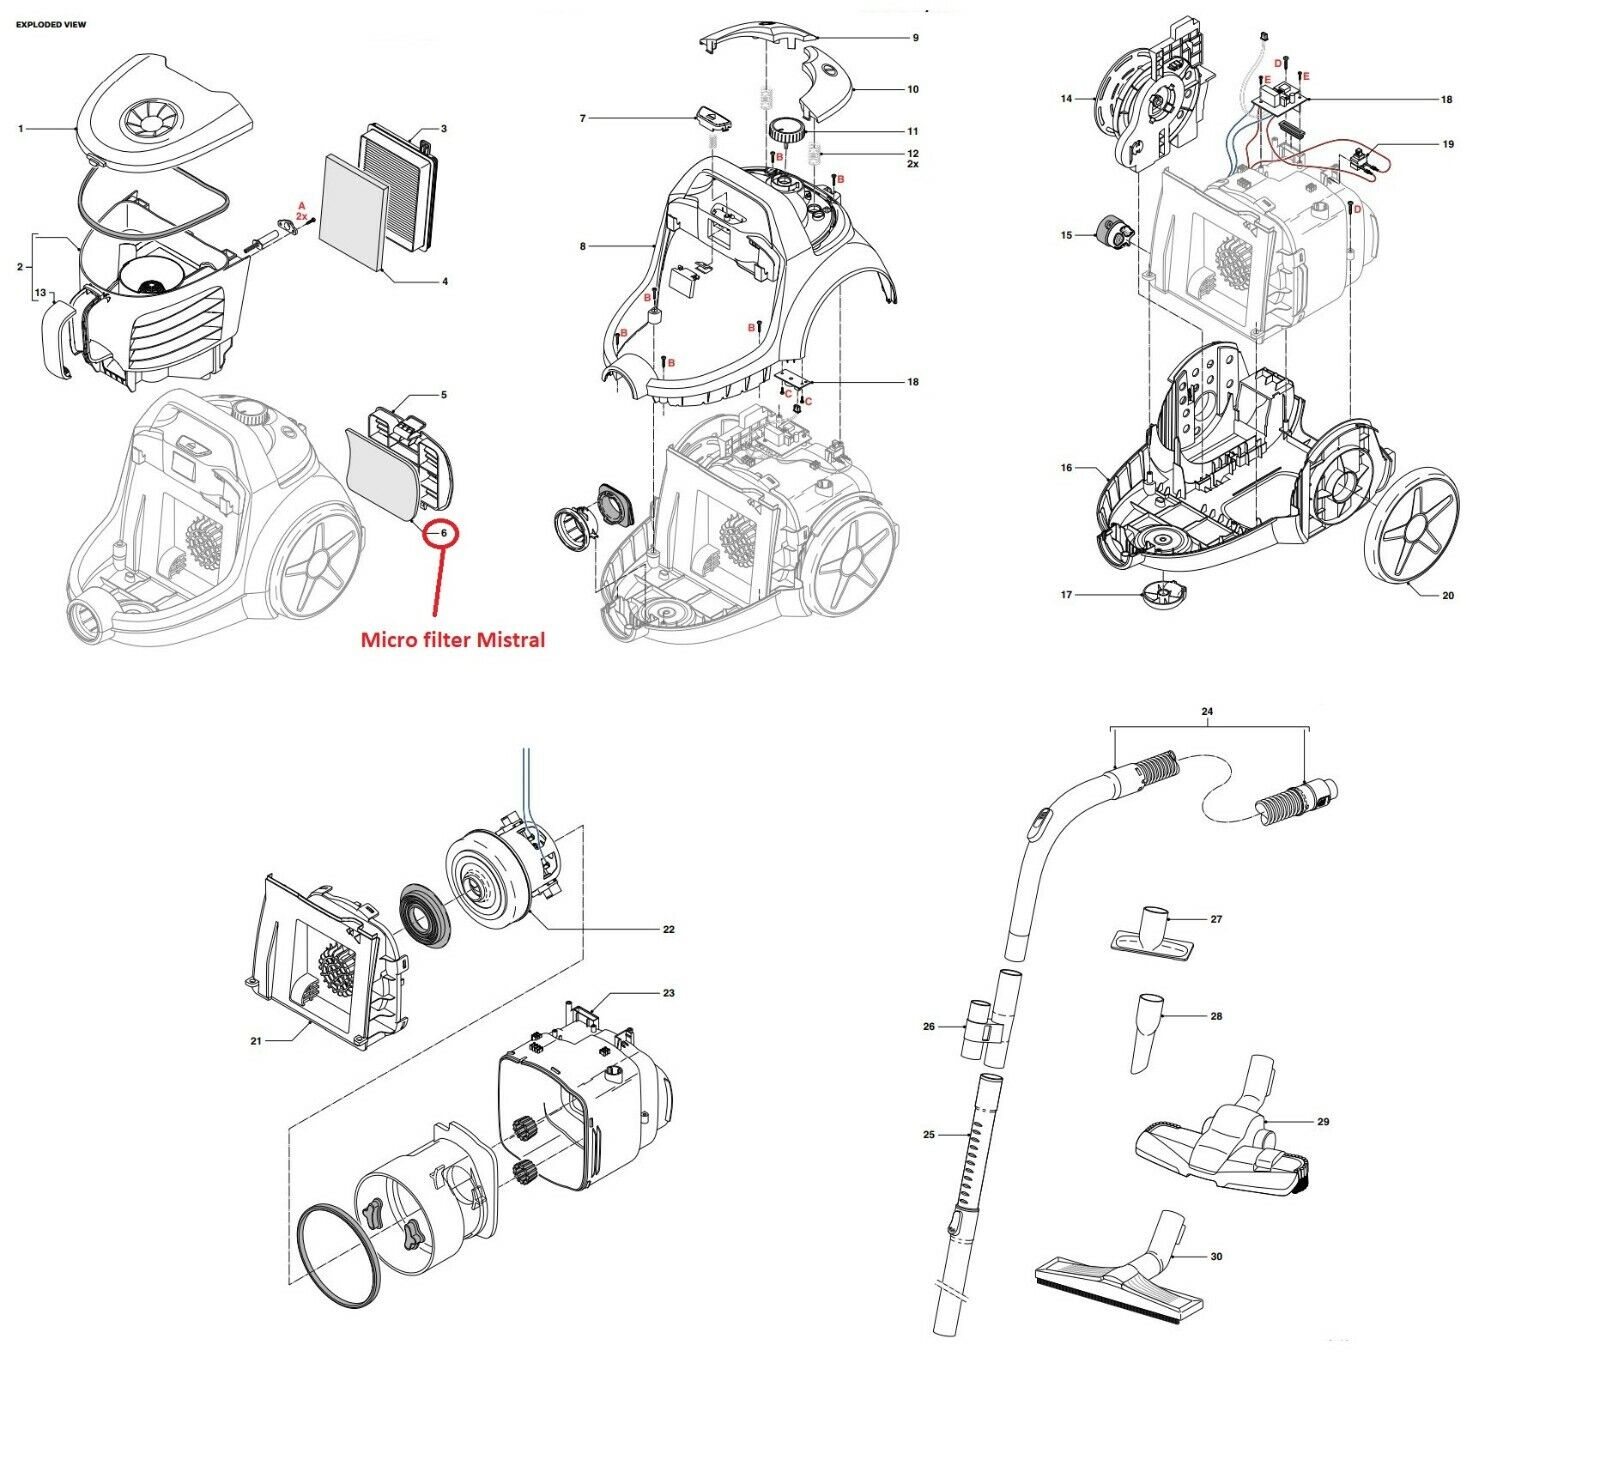 Inlet Filter Einlassfi Assy Hulk For Philips PowerPro Vacuum